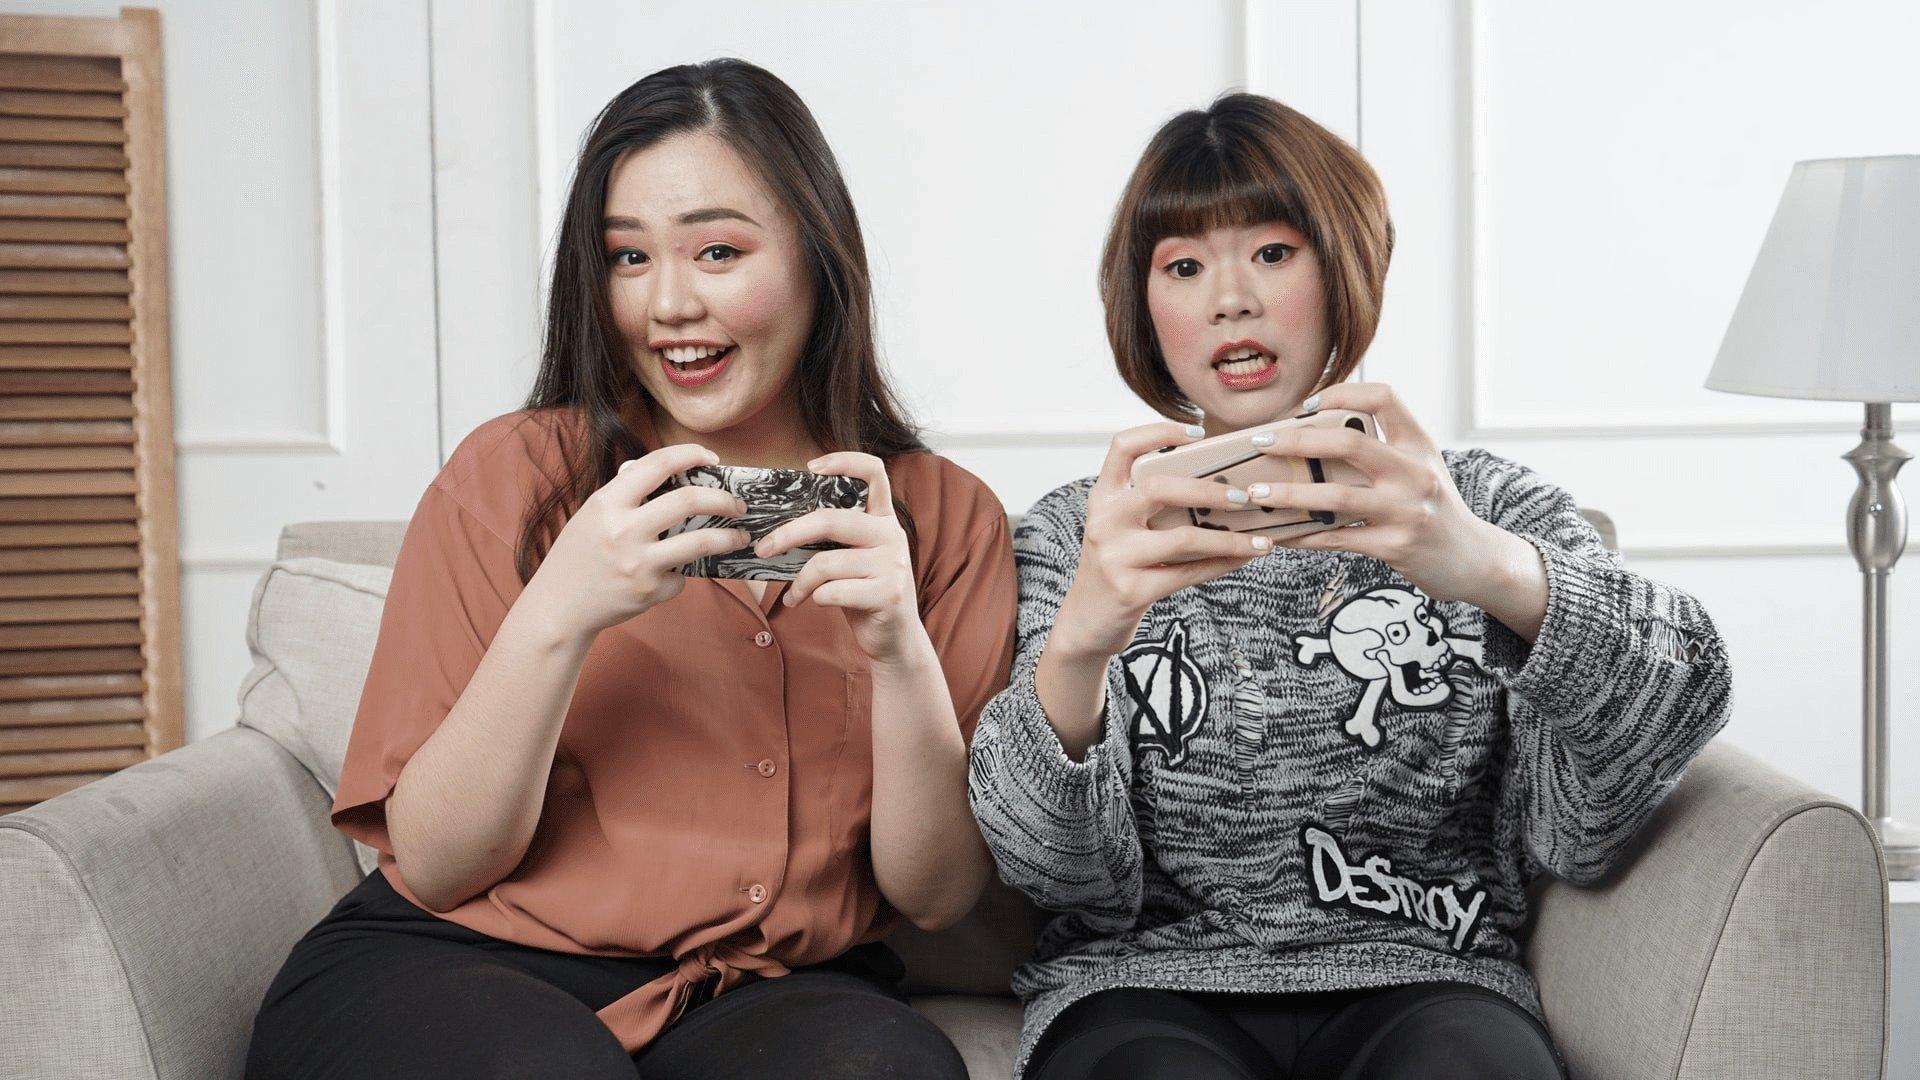 Playing Mobile Games / Photo by Afif Kusuma on Unsplash